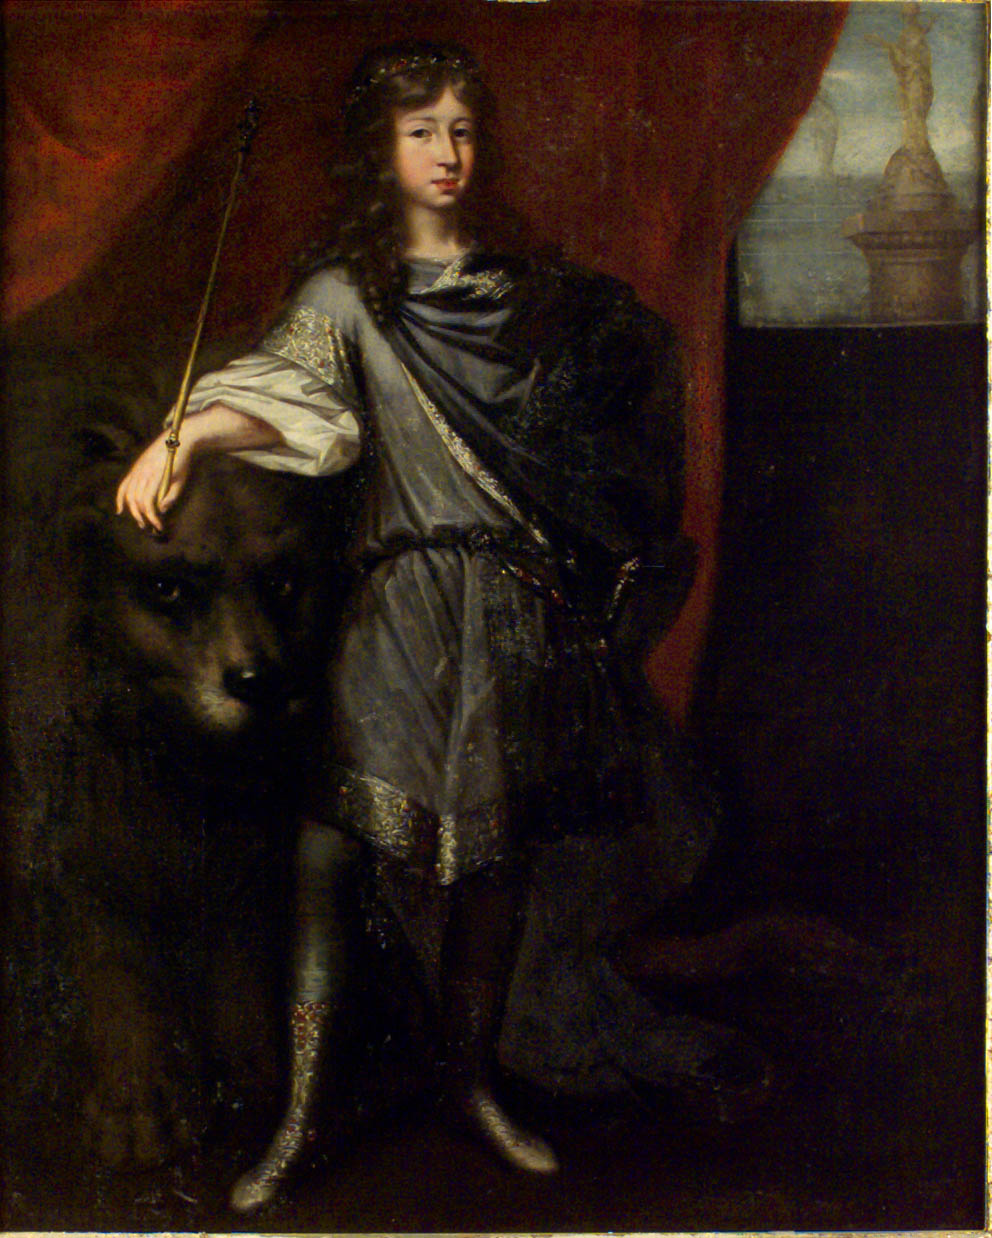 File:Kung Karl XI 1666.jpg - Wikimedia Commons